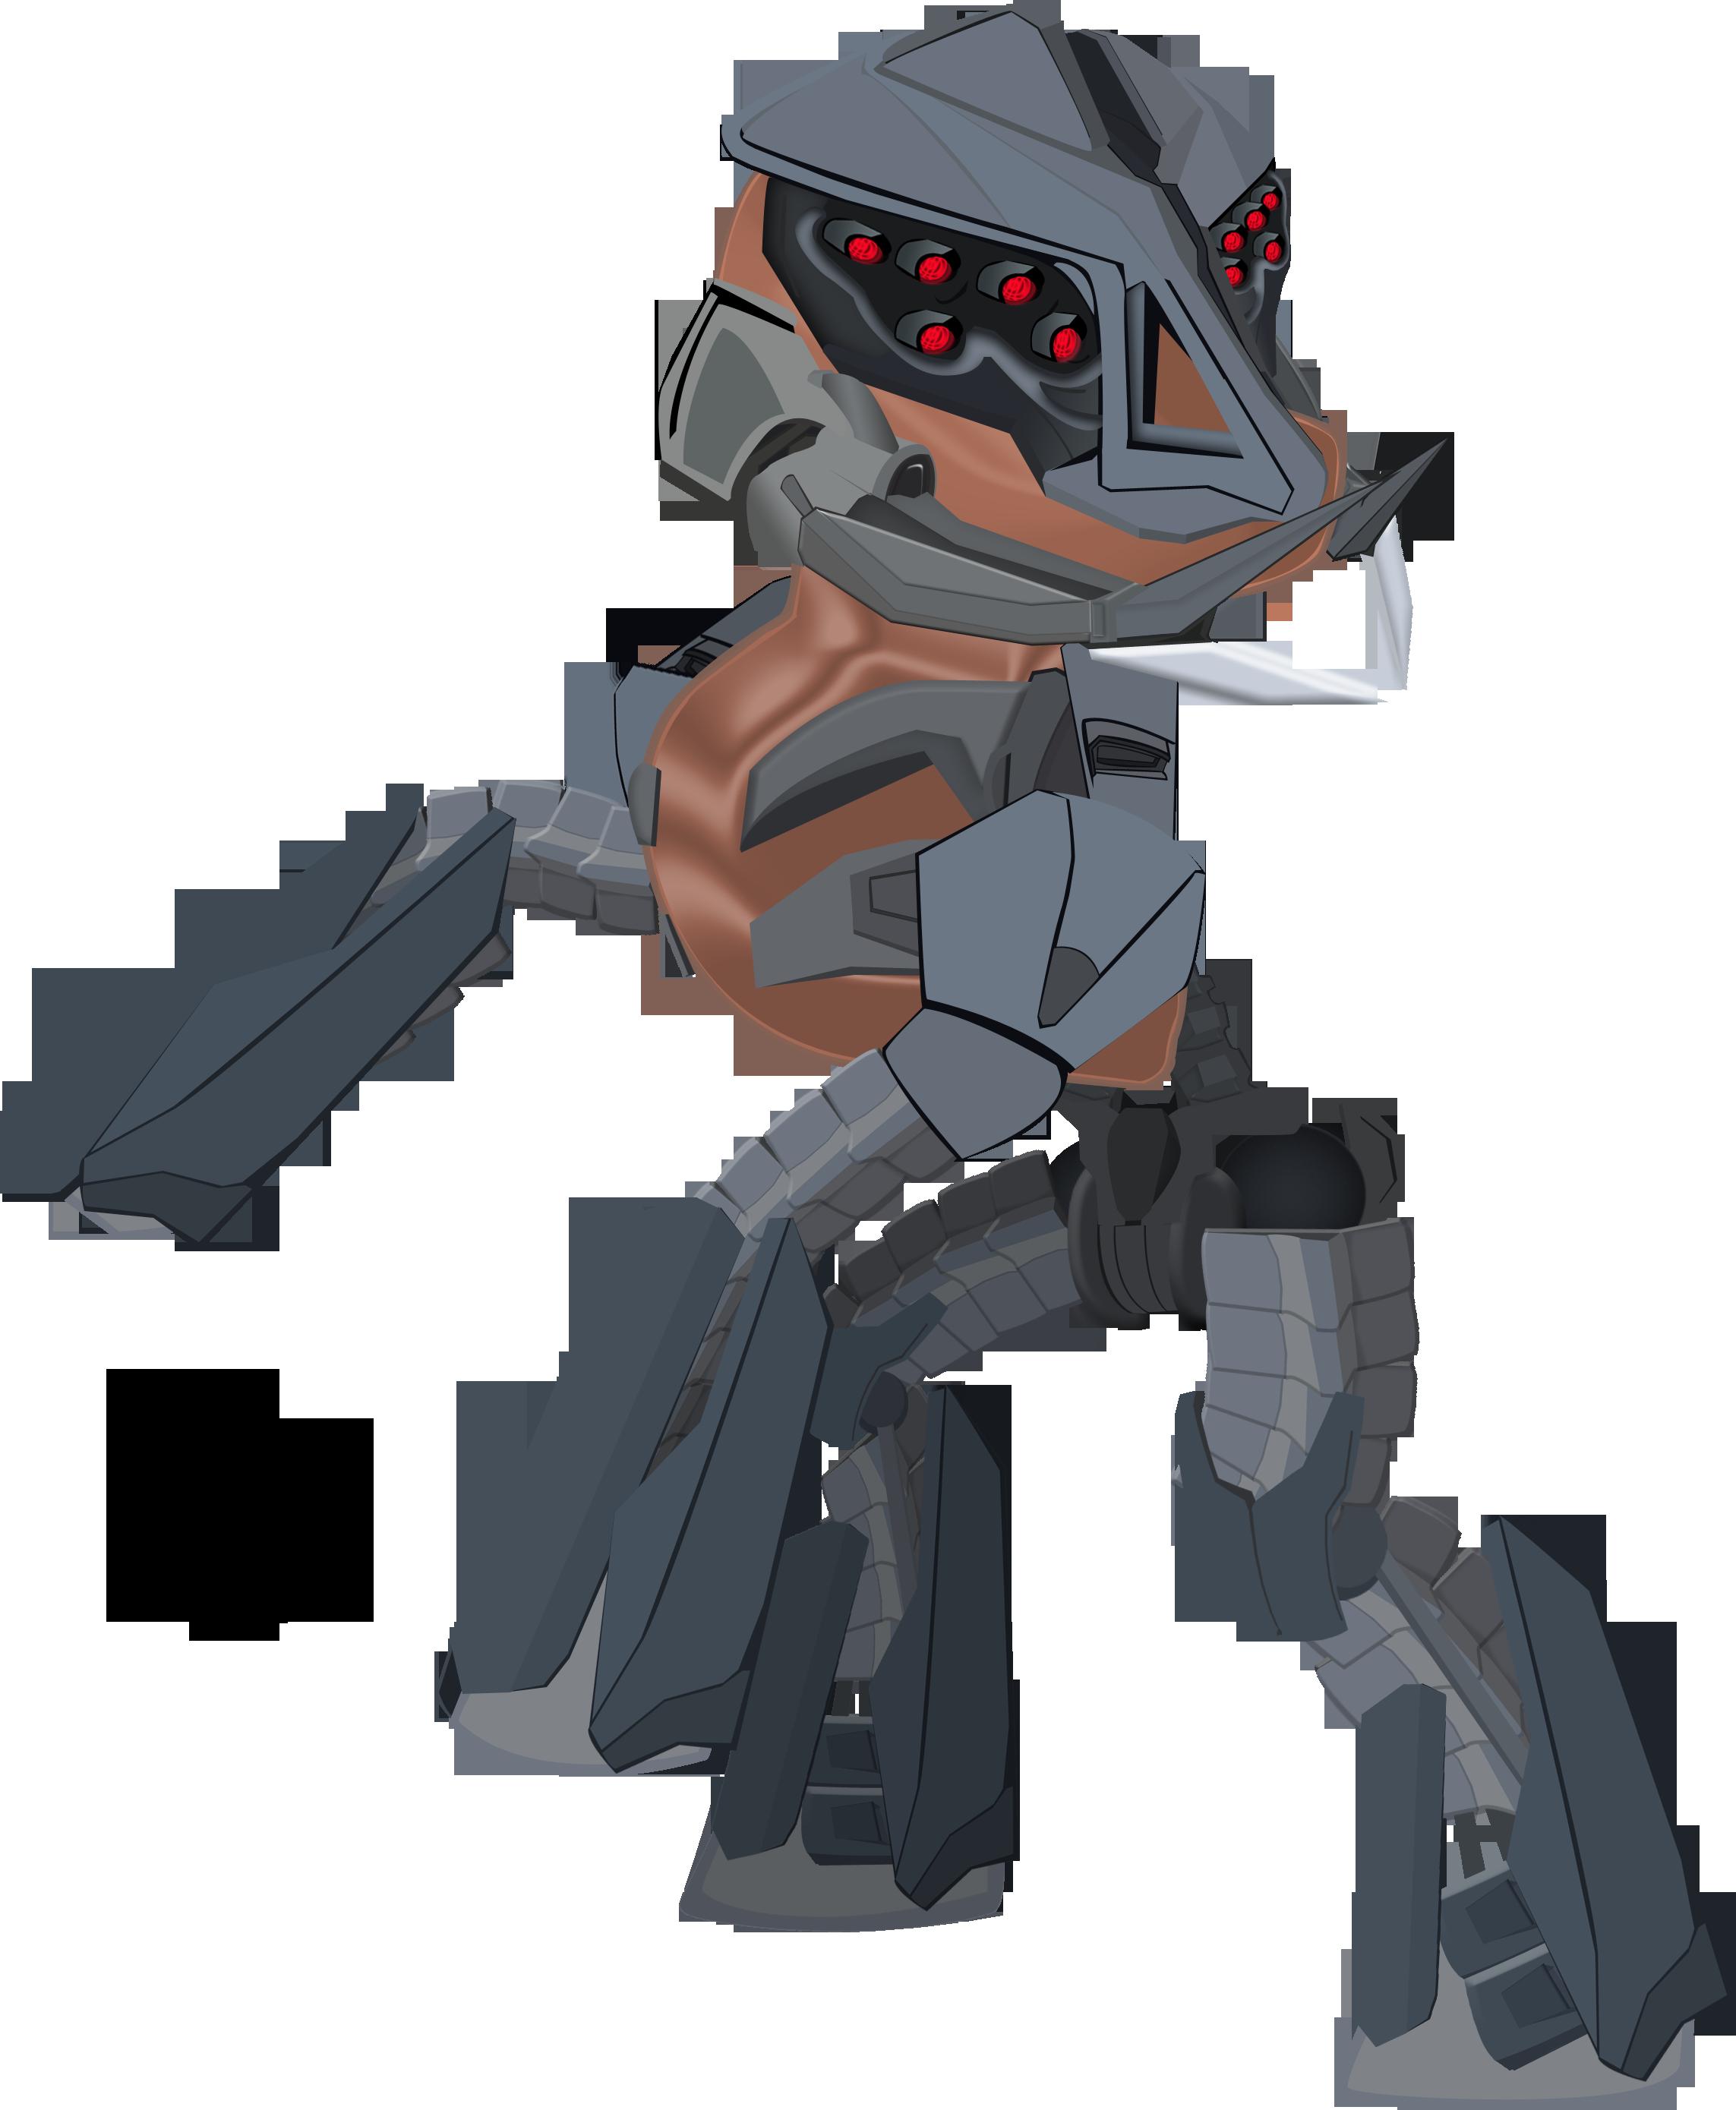 Mlp Crysis Ceph Crossover By Xeno Scorpion Alien On Deviantart